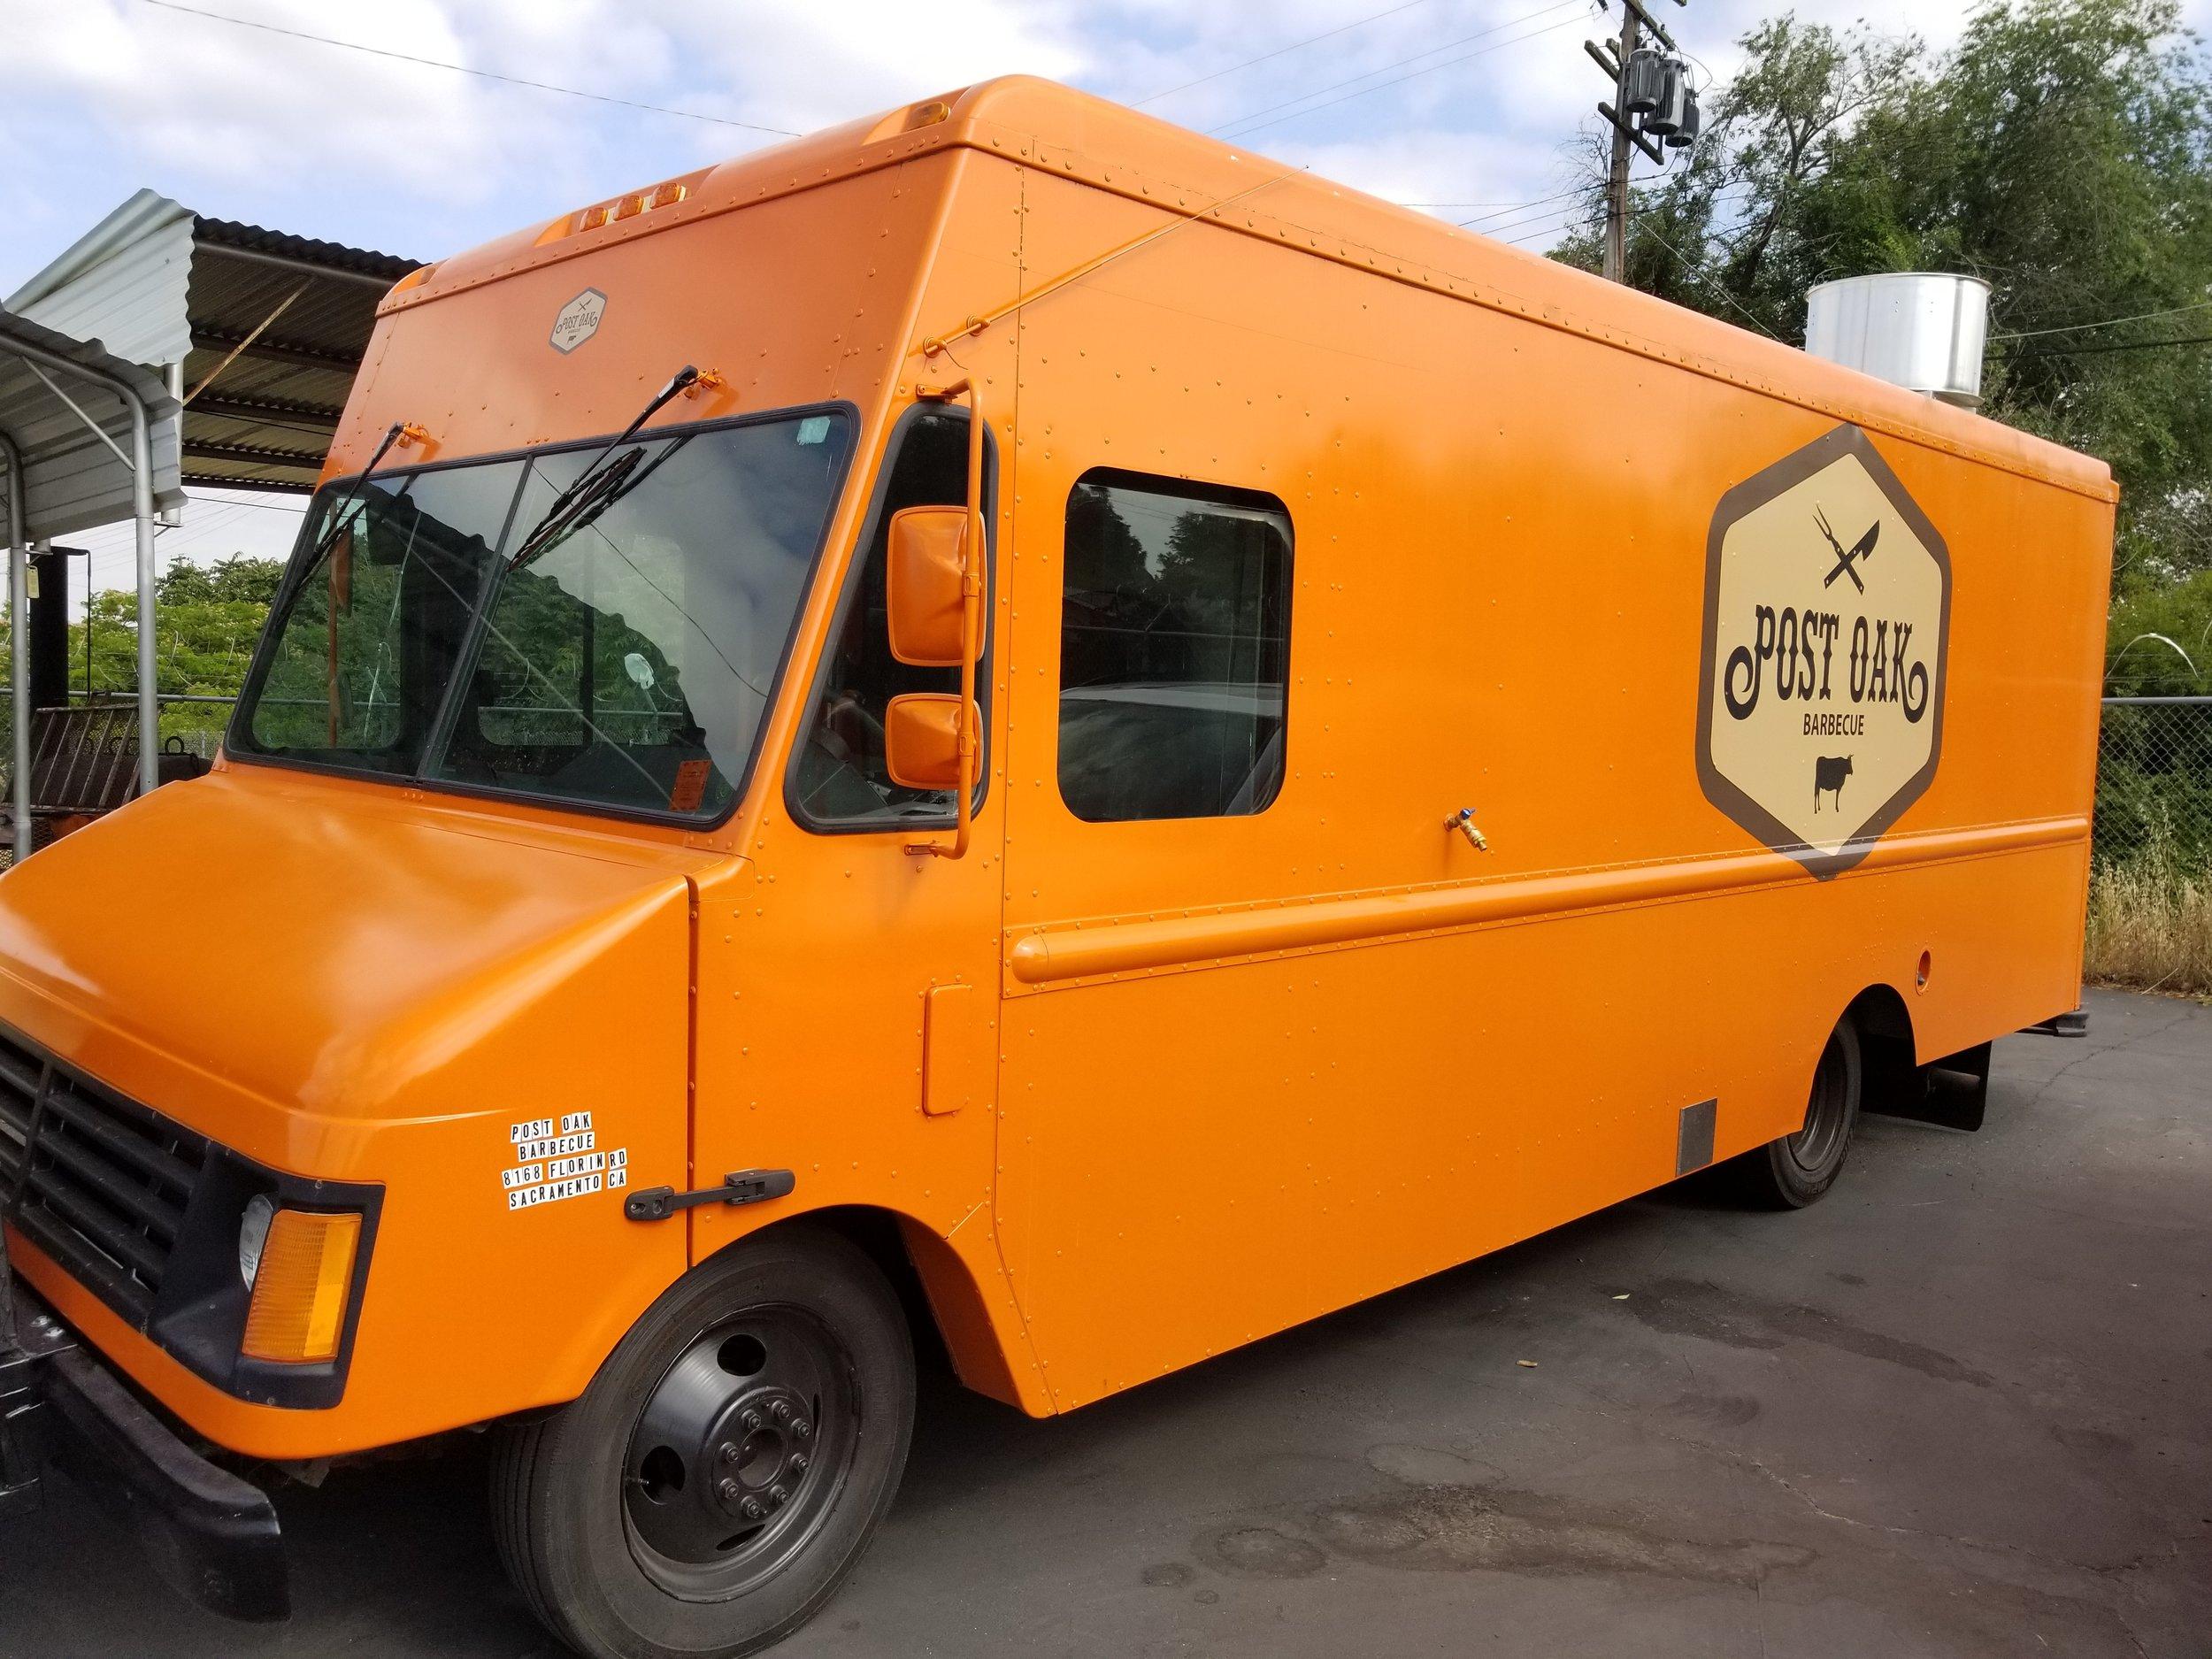 Post Oak Barbecue Food Truck